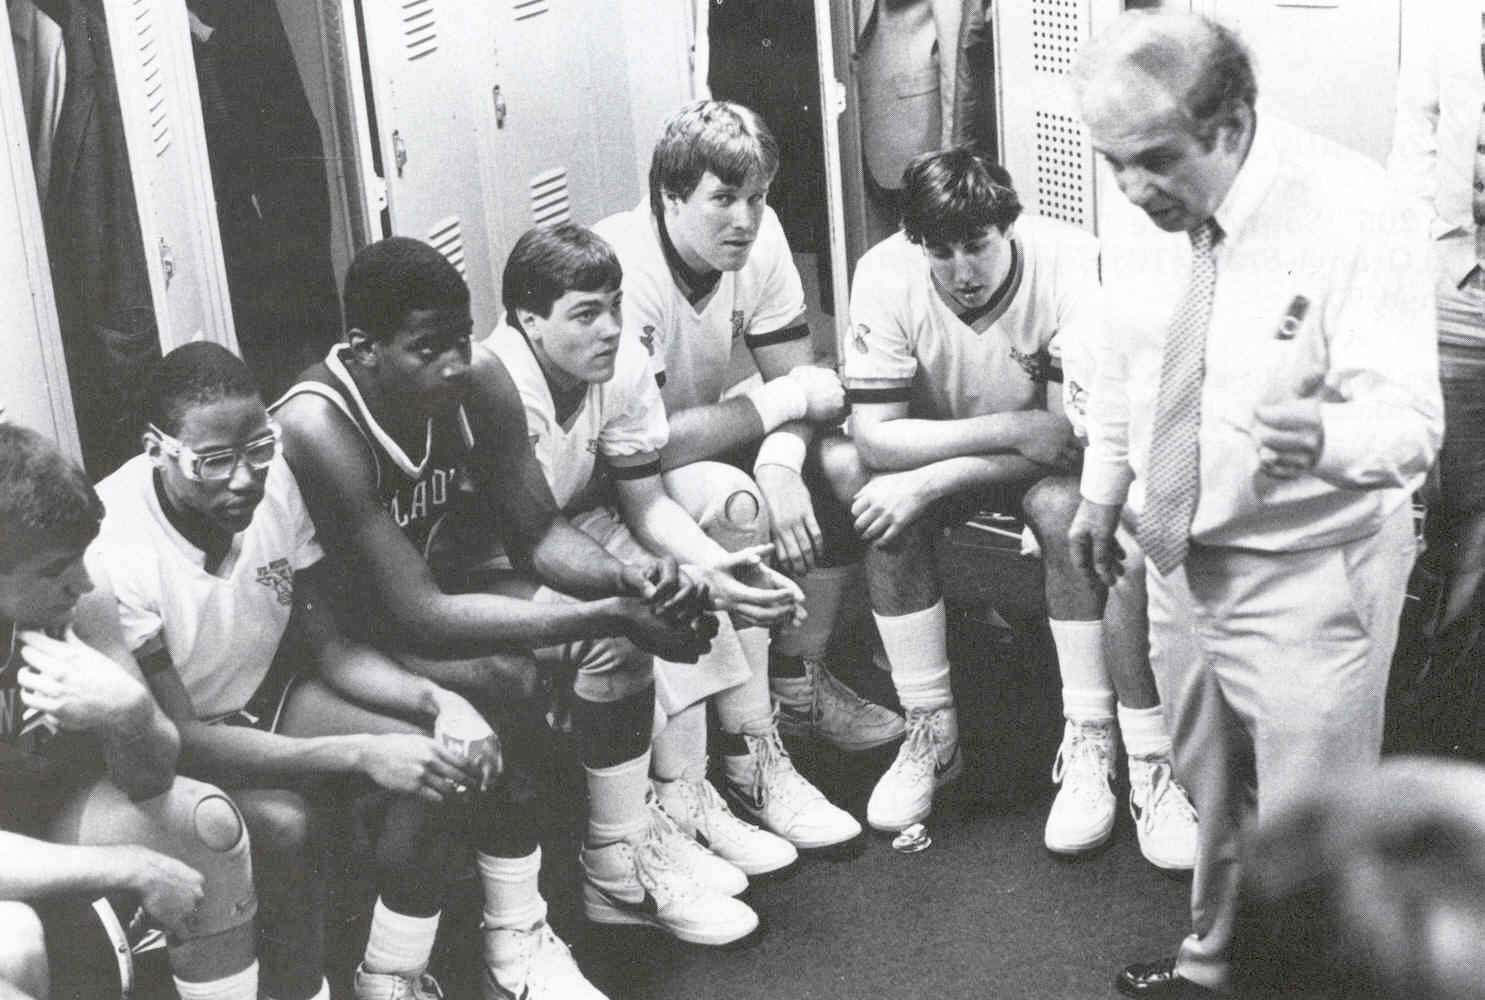 Gary McLain Led Villanova's Charge While High on Cocaine in 1985 Final Four